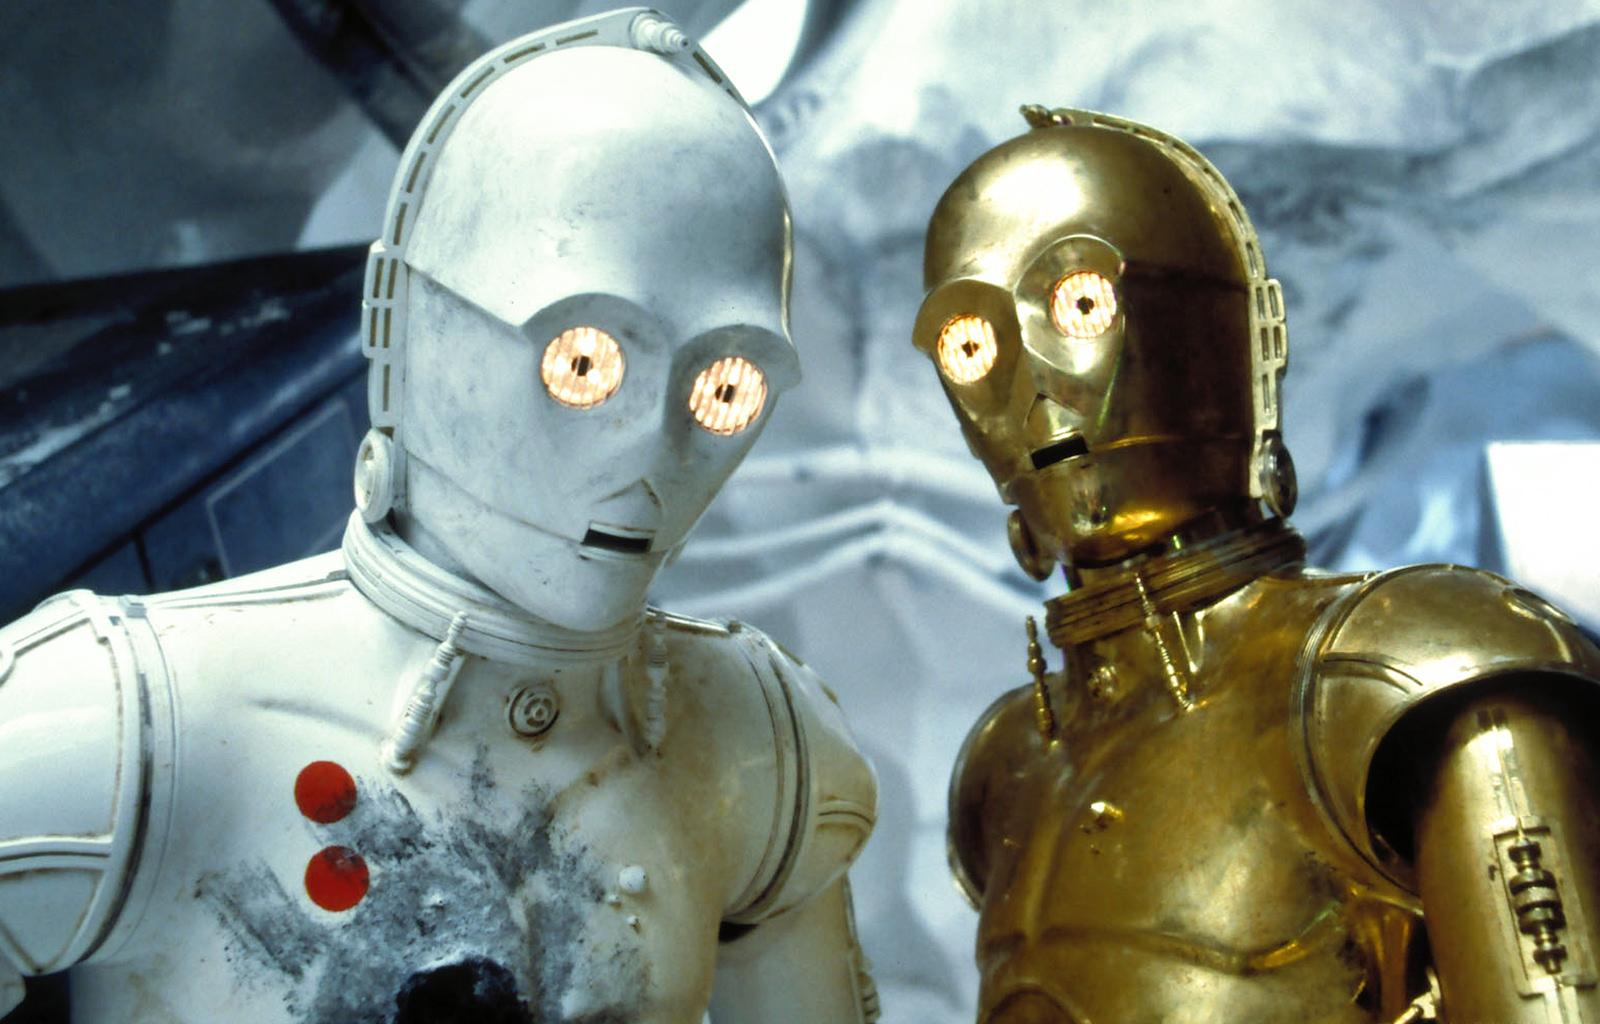 3PO-series protocol droid/Legends